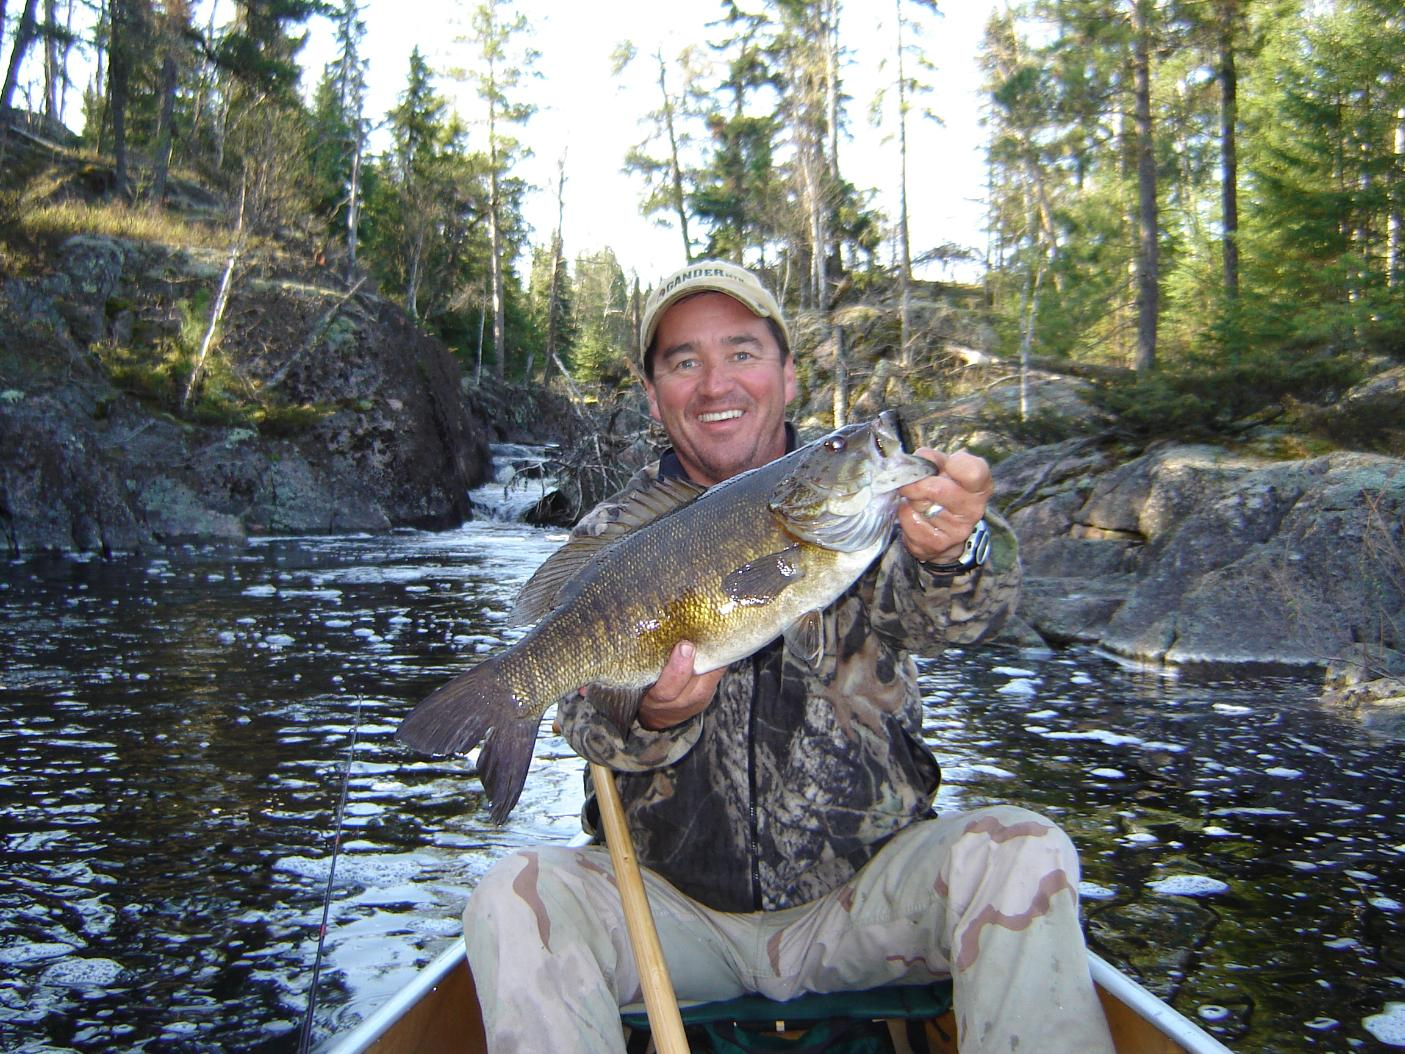 Bwca big smallie hotspot boundary waters fishing forum for Boundary waters fishing